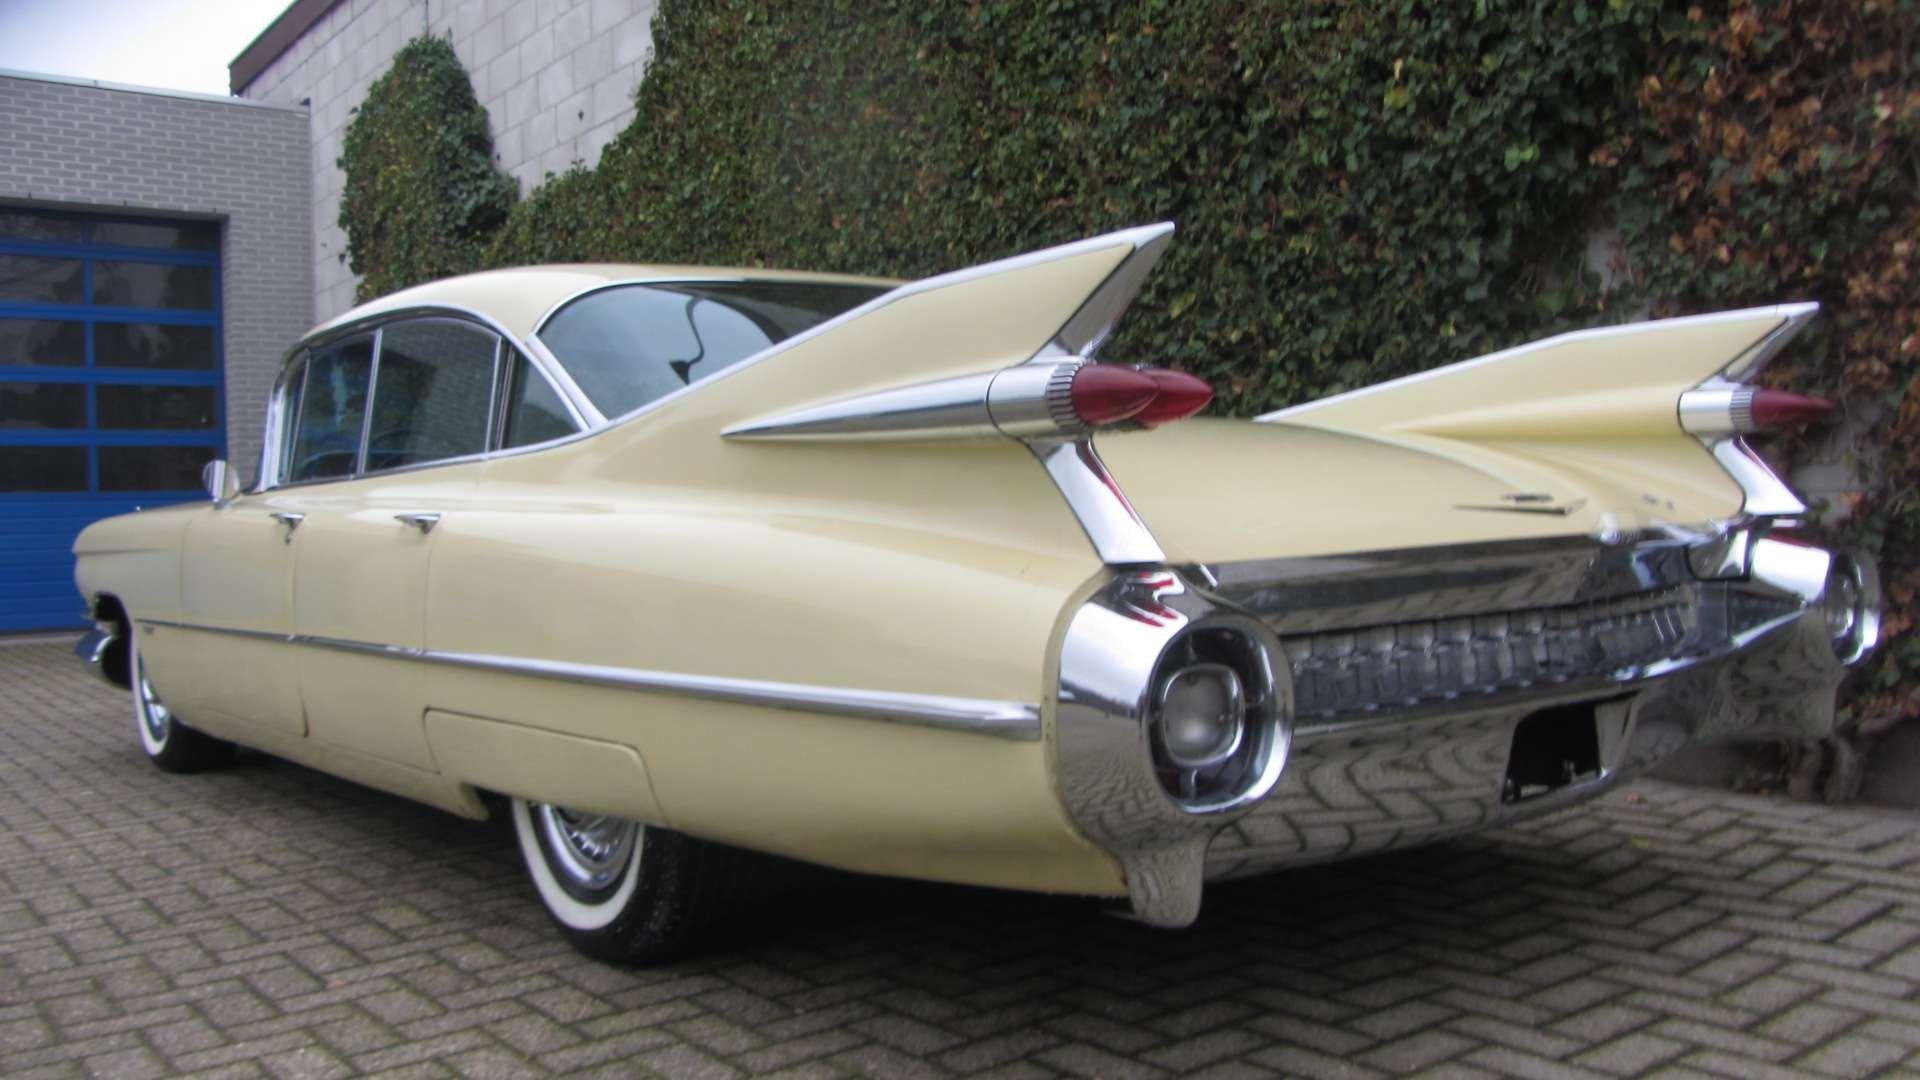 Cadillac Sedan de Ville 1959 & 50 USA Classics For Sale (picture 1 of 6)